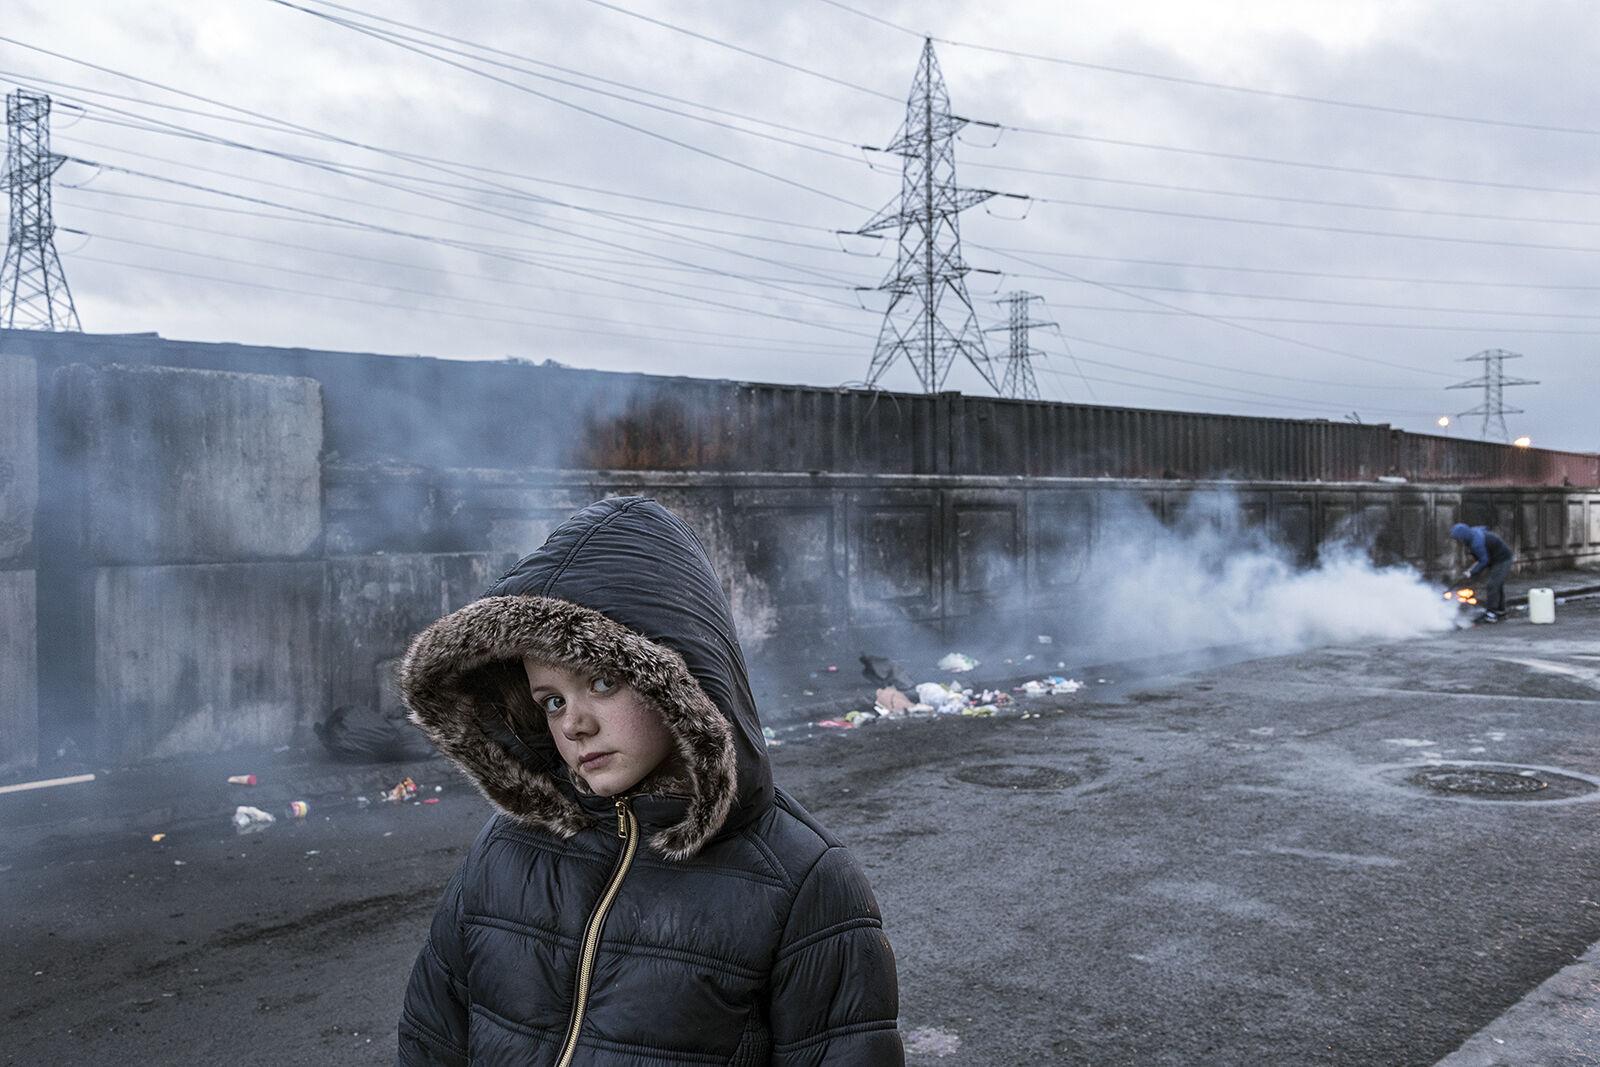 Alesha with Fur Hoodie, Dublin, Ireland 2020